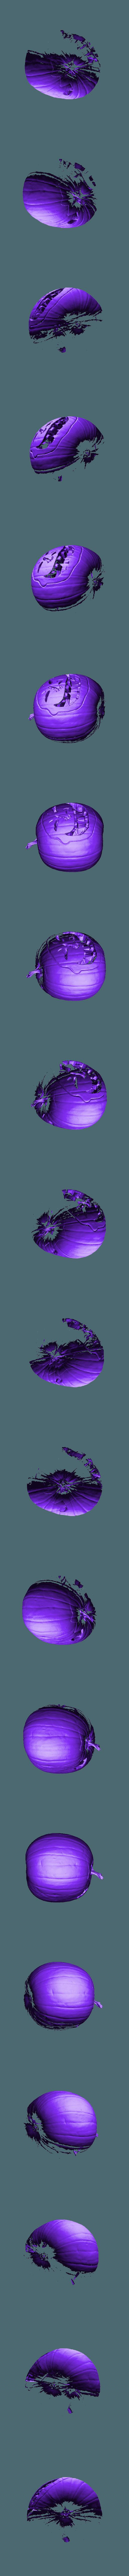 FacePumpkinSolid.stl Download free STL file Halloween Pumpkin With Face (3D Scan) • 3D print object, 3DWP